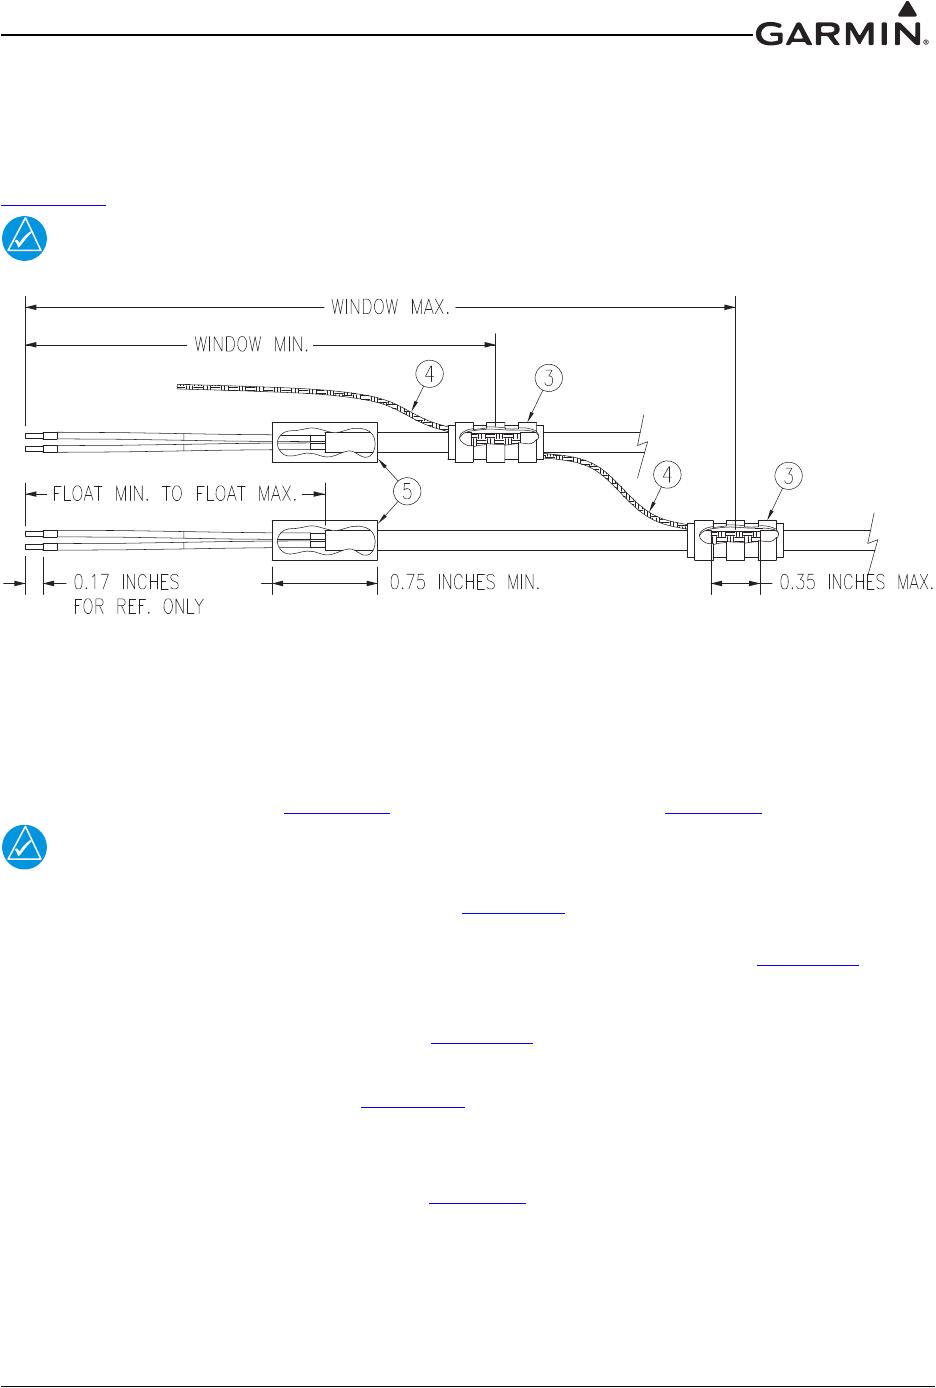 Garmin Gtr 200 Wiring Diagram Garmin Gtr 200 Installation Manual 190 01553 00